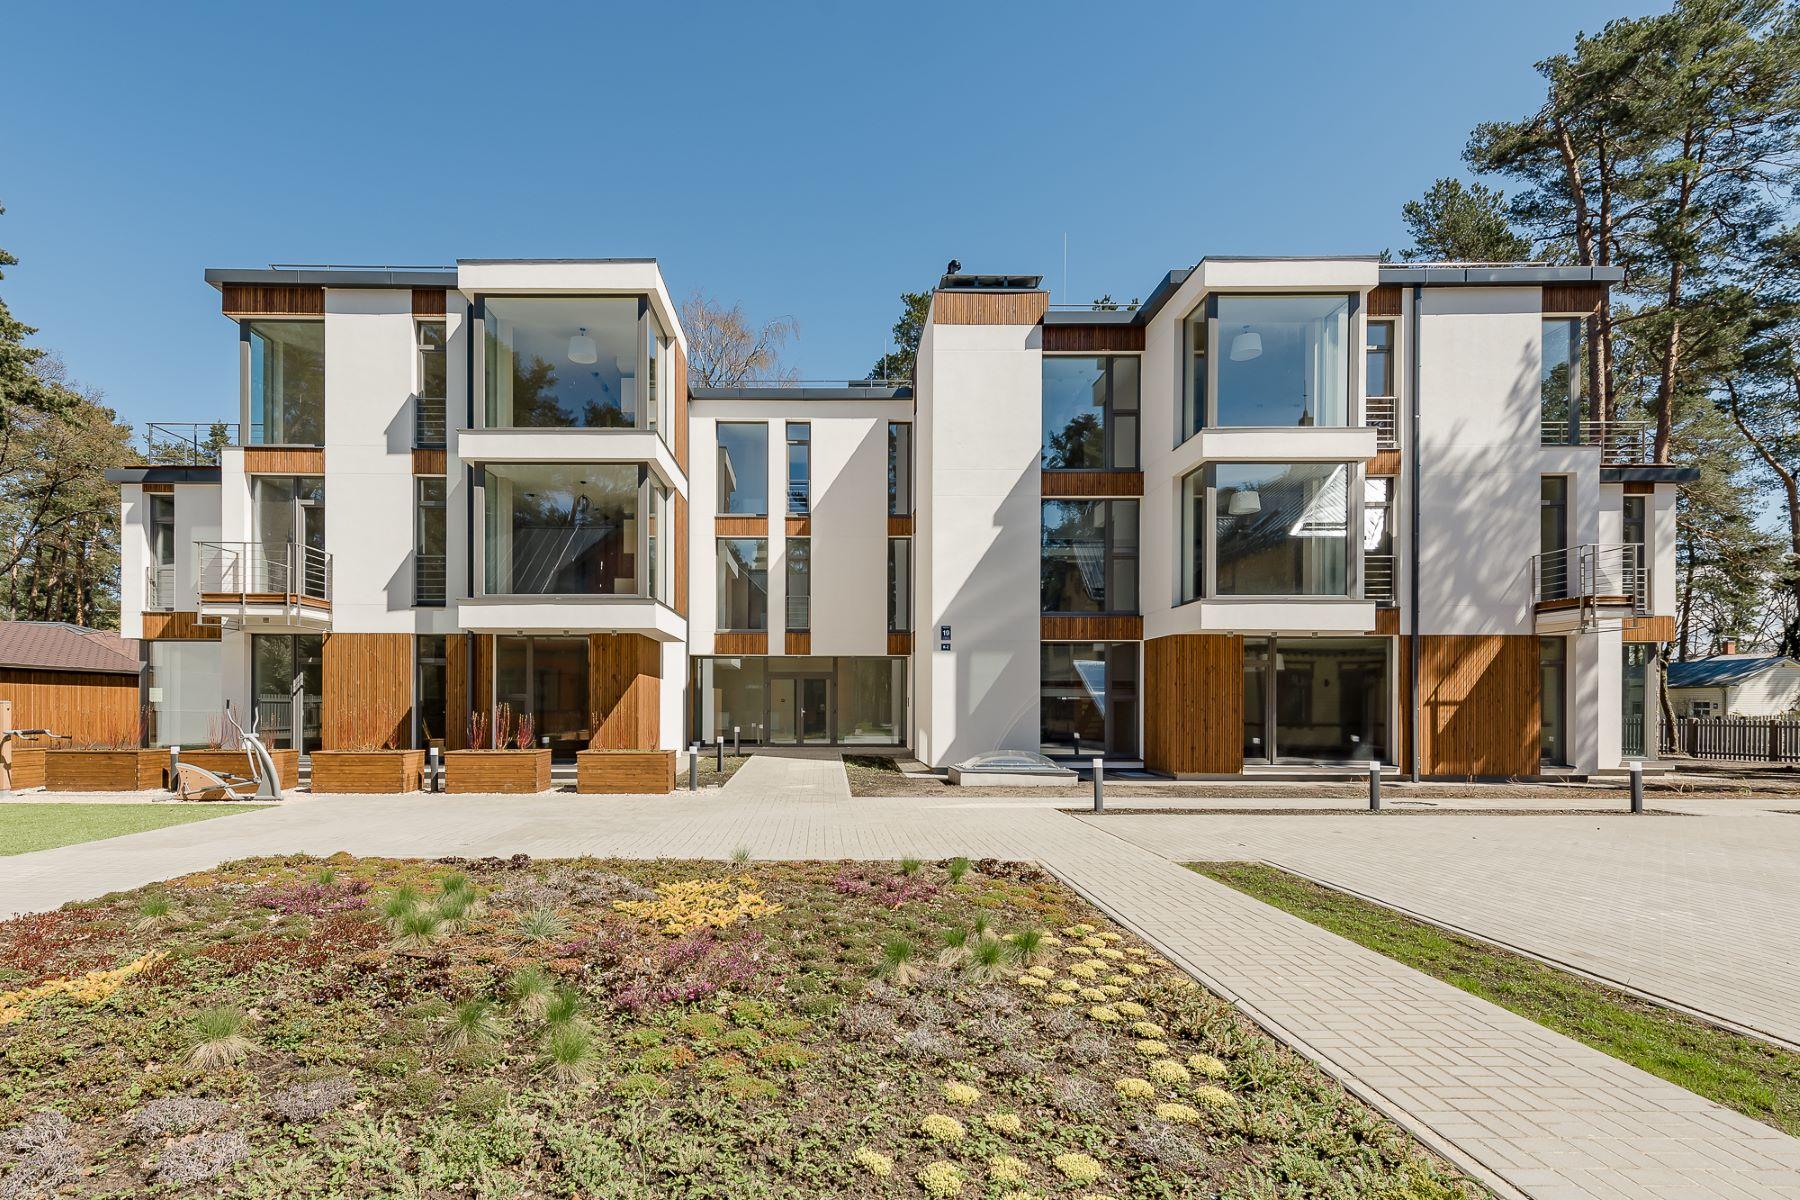 Appartement pour l à vendre à The apartment in the new development in Jurmala Jurmala, Rigas County, Lettonie